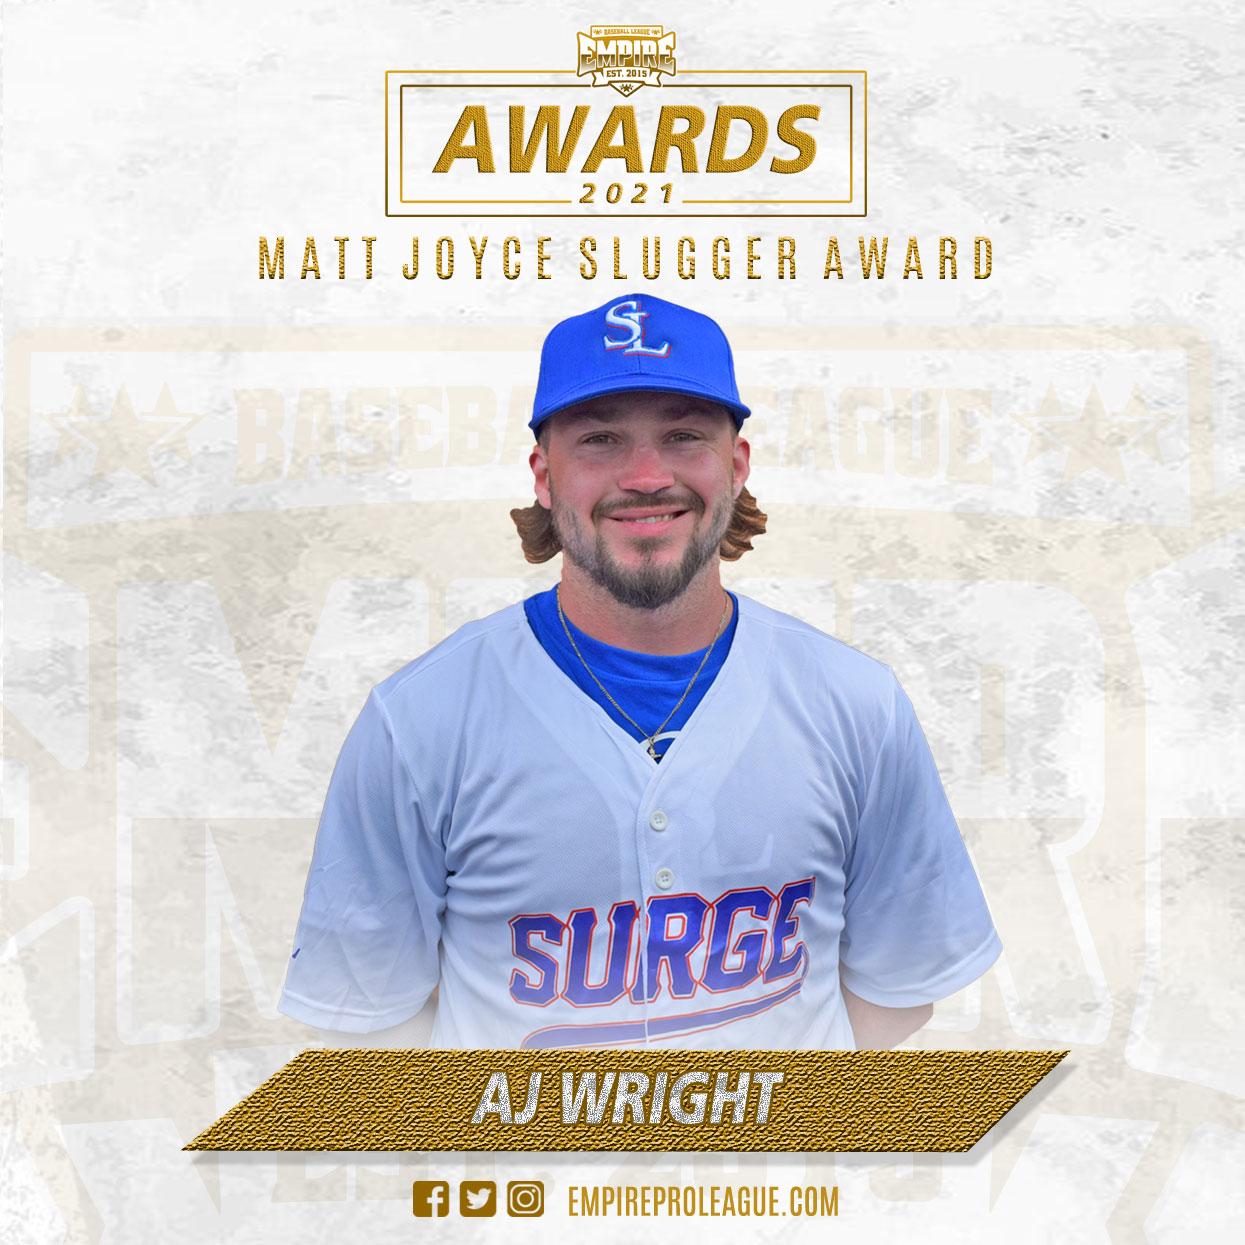 Awards-Matt-Joyce-Silver-Slugger